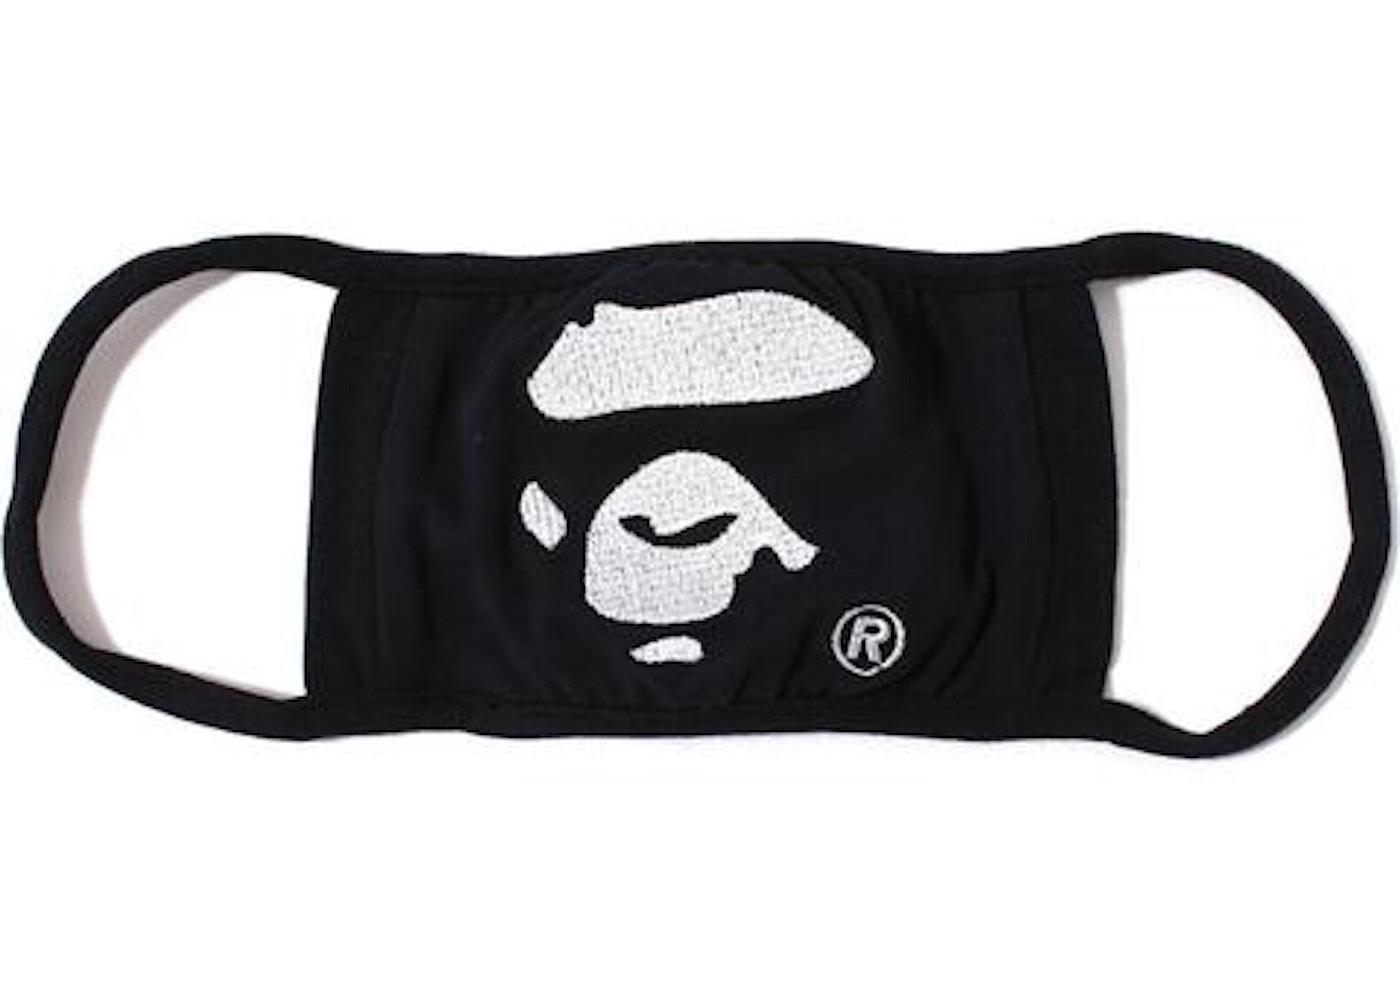 Bape Ape Face Mask Black Buy Or Sell On Stockx